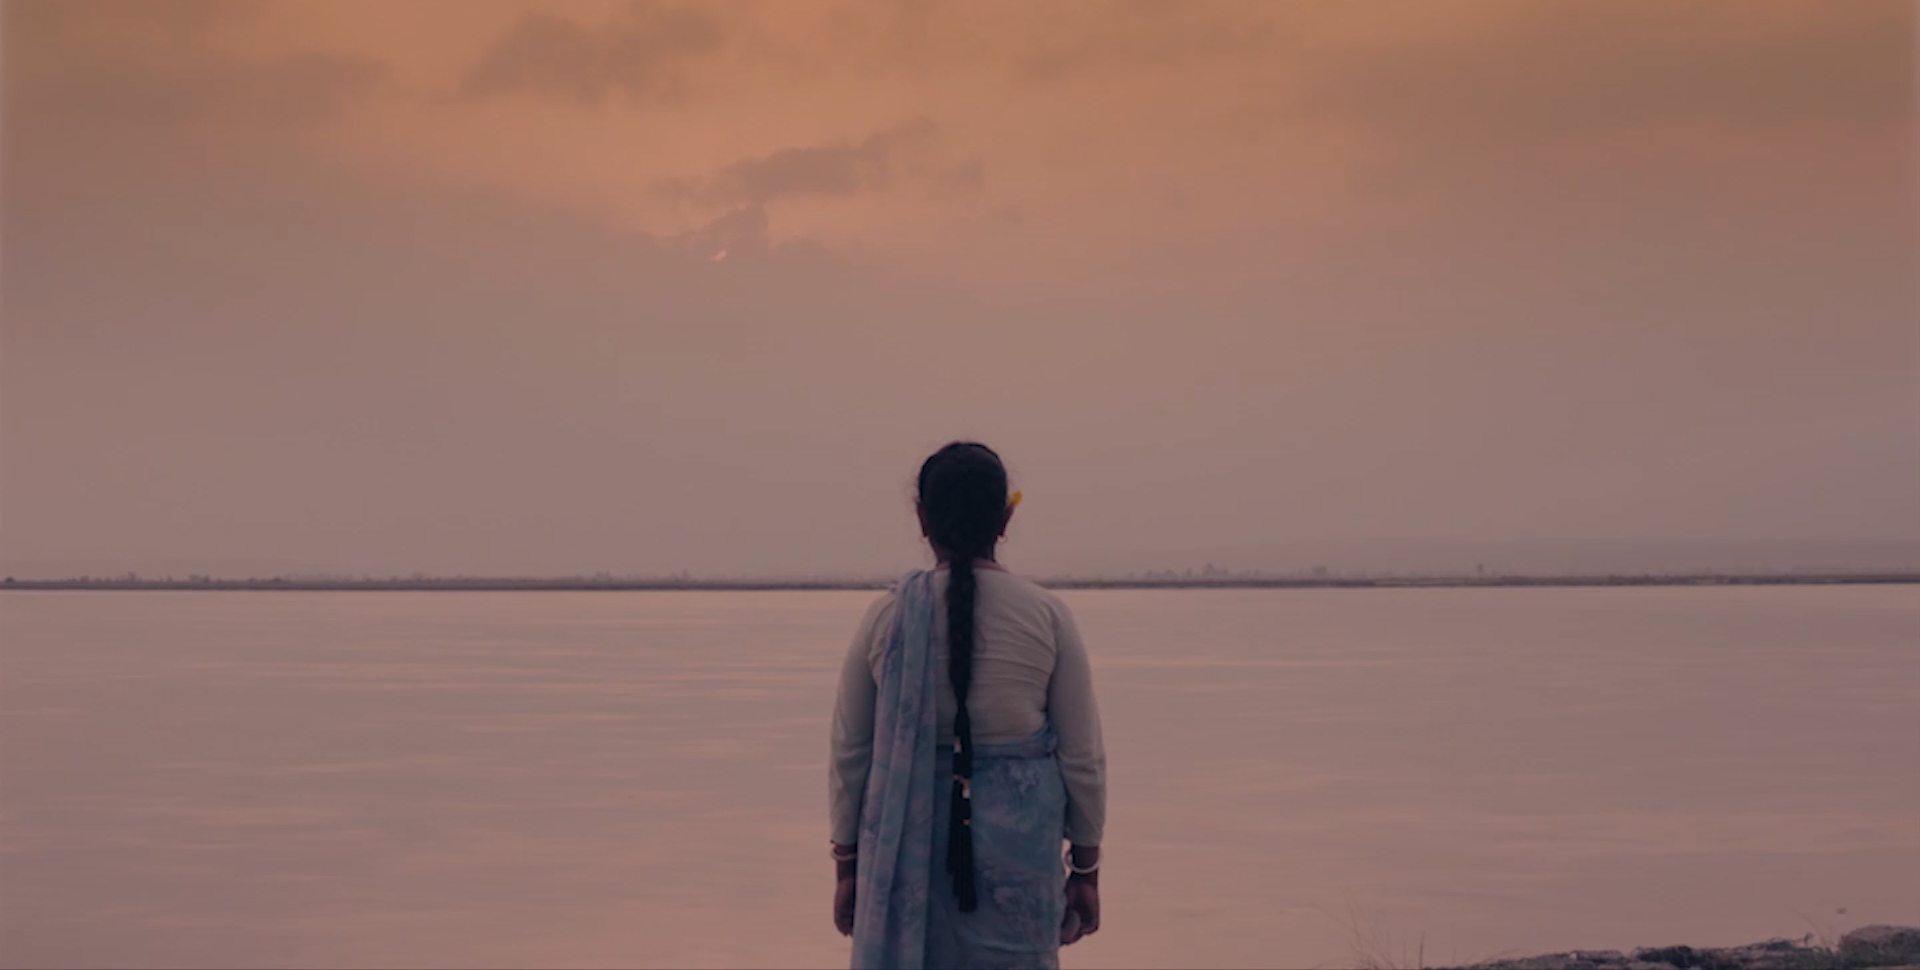 https://mdfilmfest.com/wp-content/uploads/Ananta-Yatra-Still-Picture-5.jpg